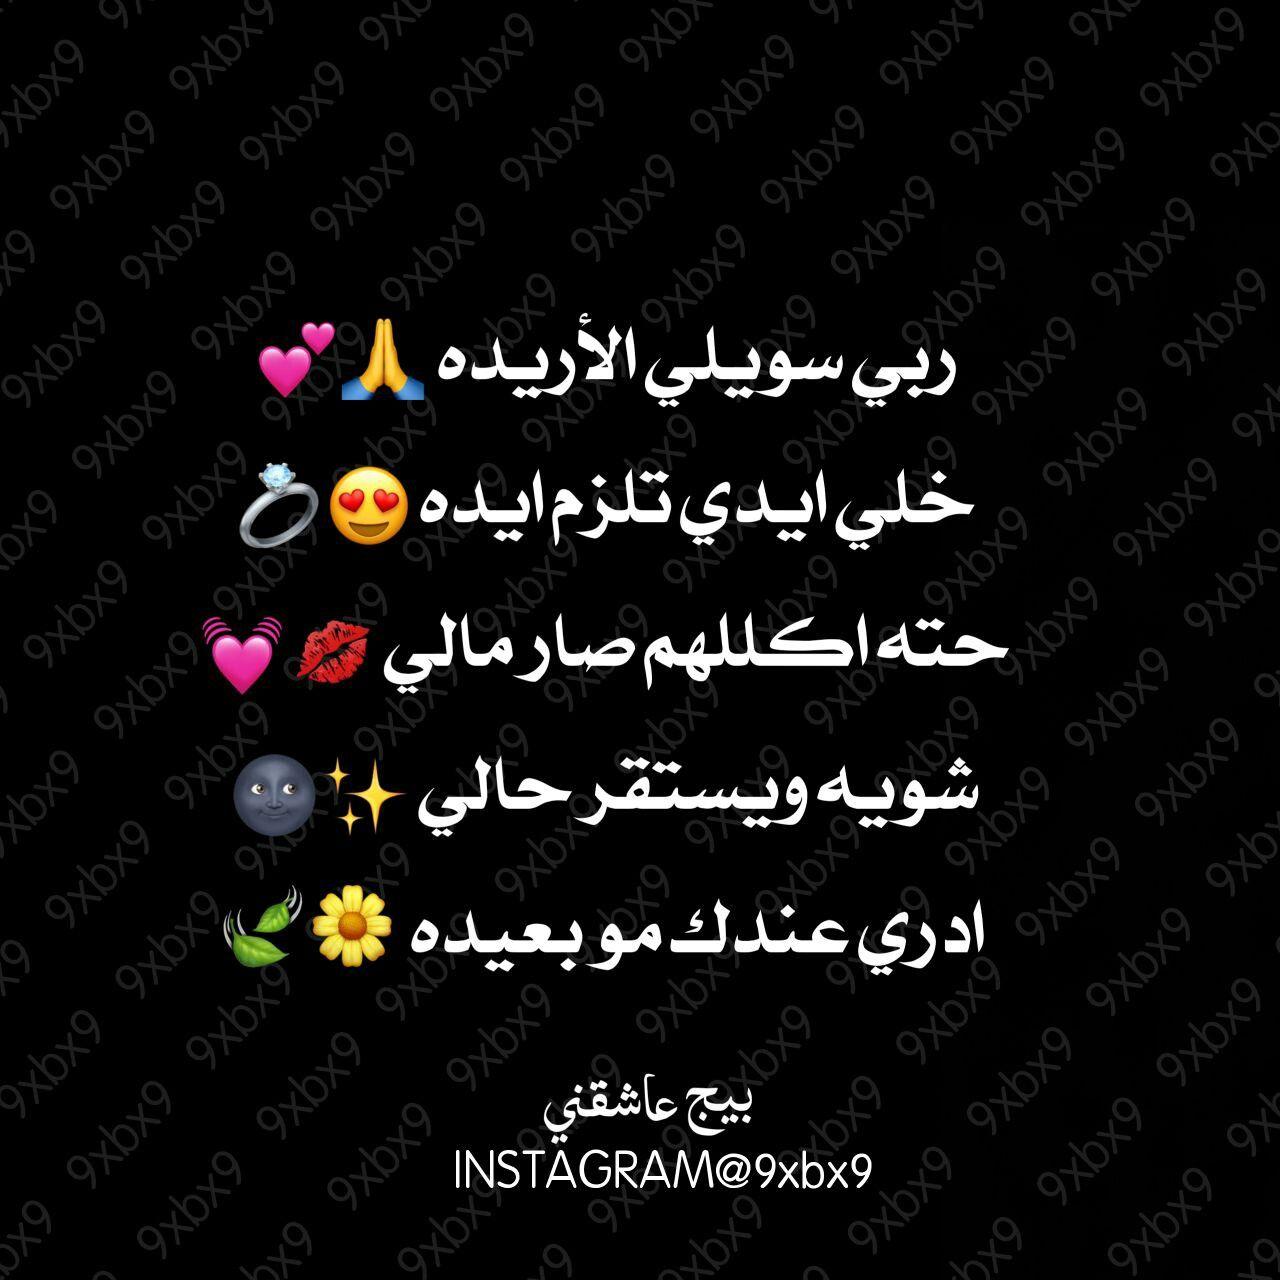 غزل عراقي حب شعر Cover Photo Quotes Love Quotes Wallpaper Beautiful Arabic Words